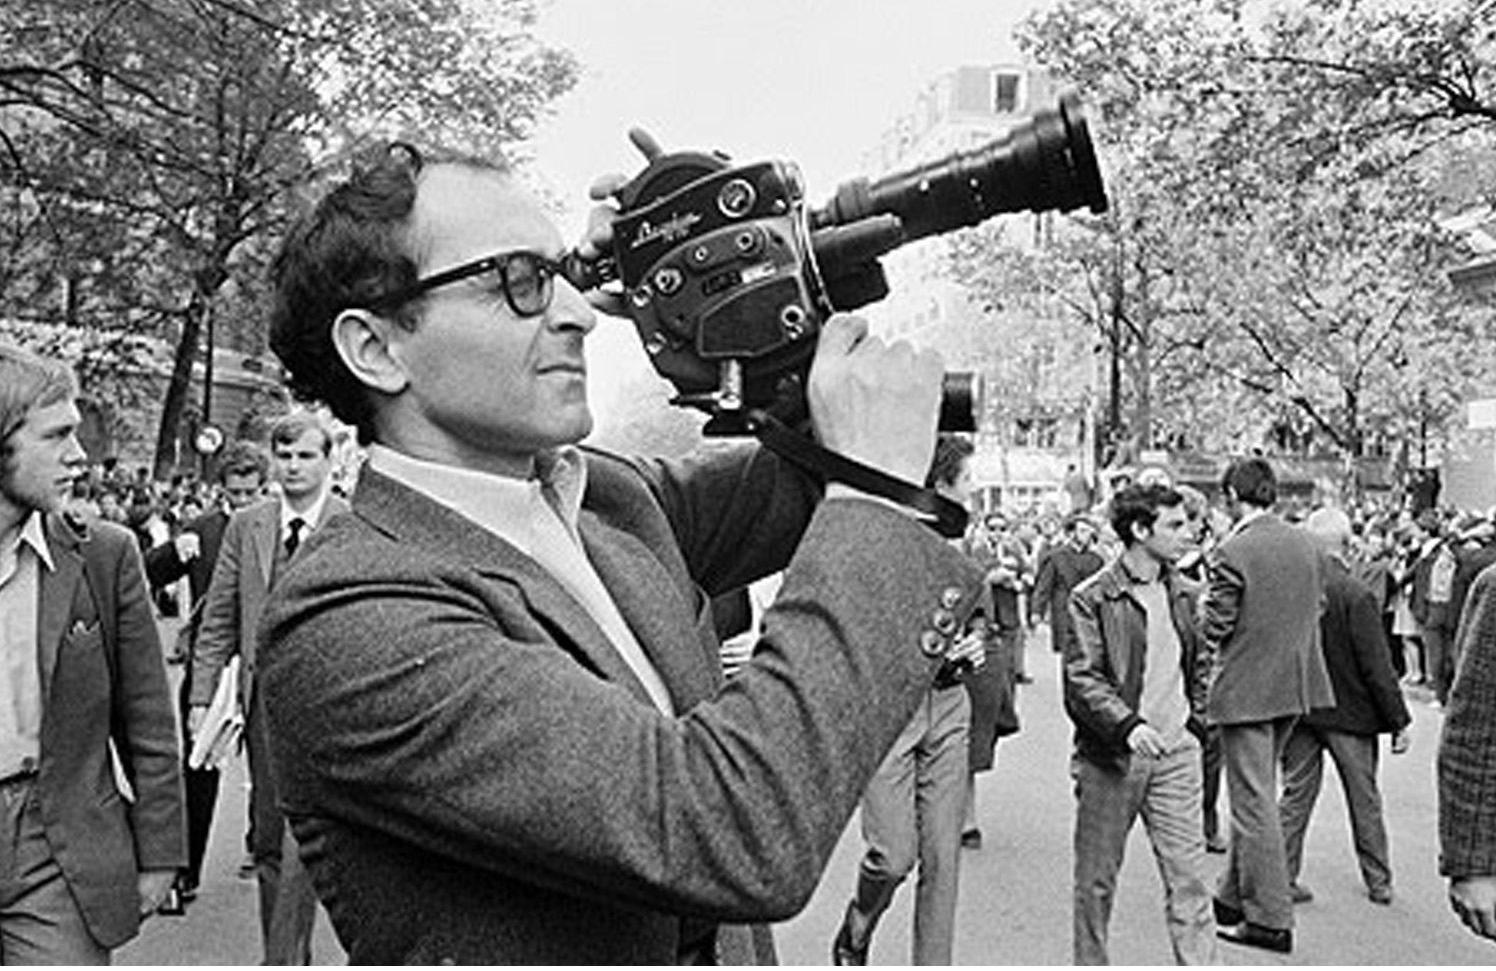 Jean-Luc Godard | Jean,Luc Godard